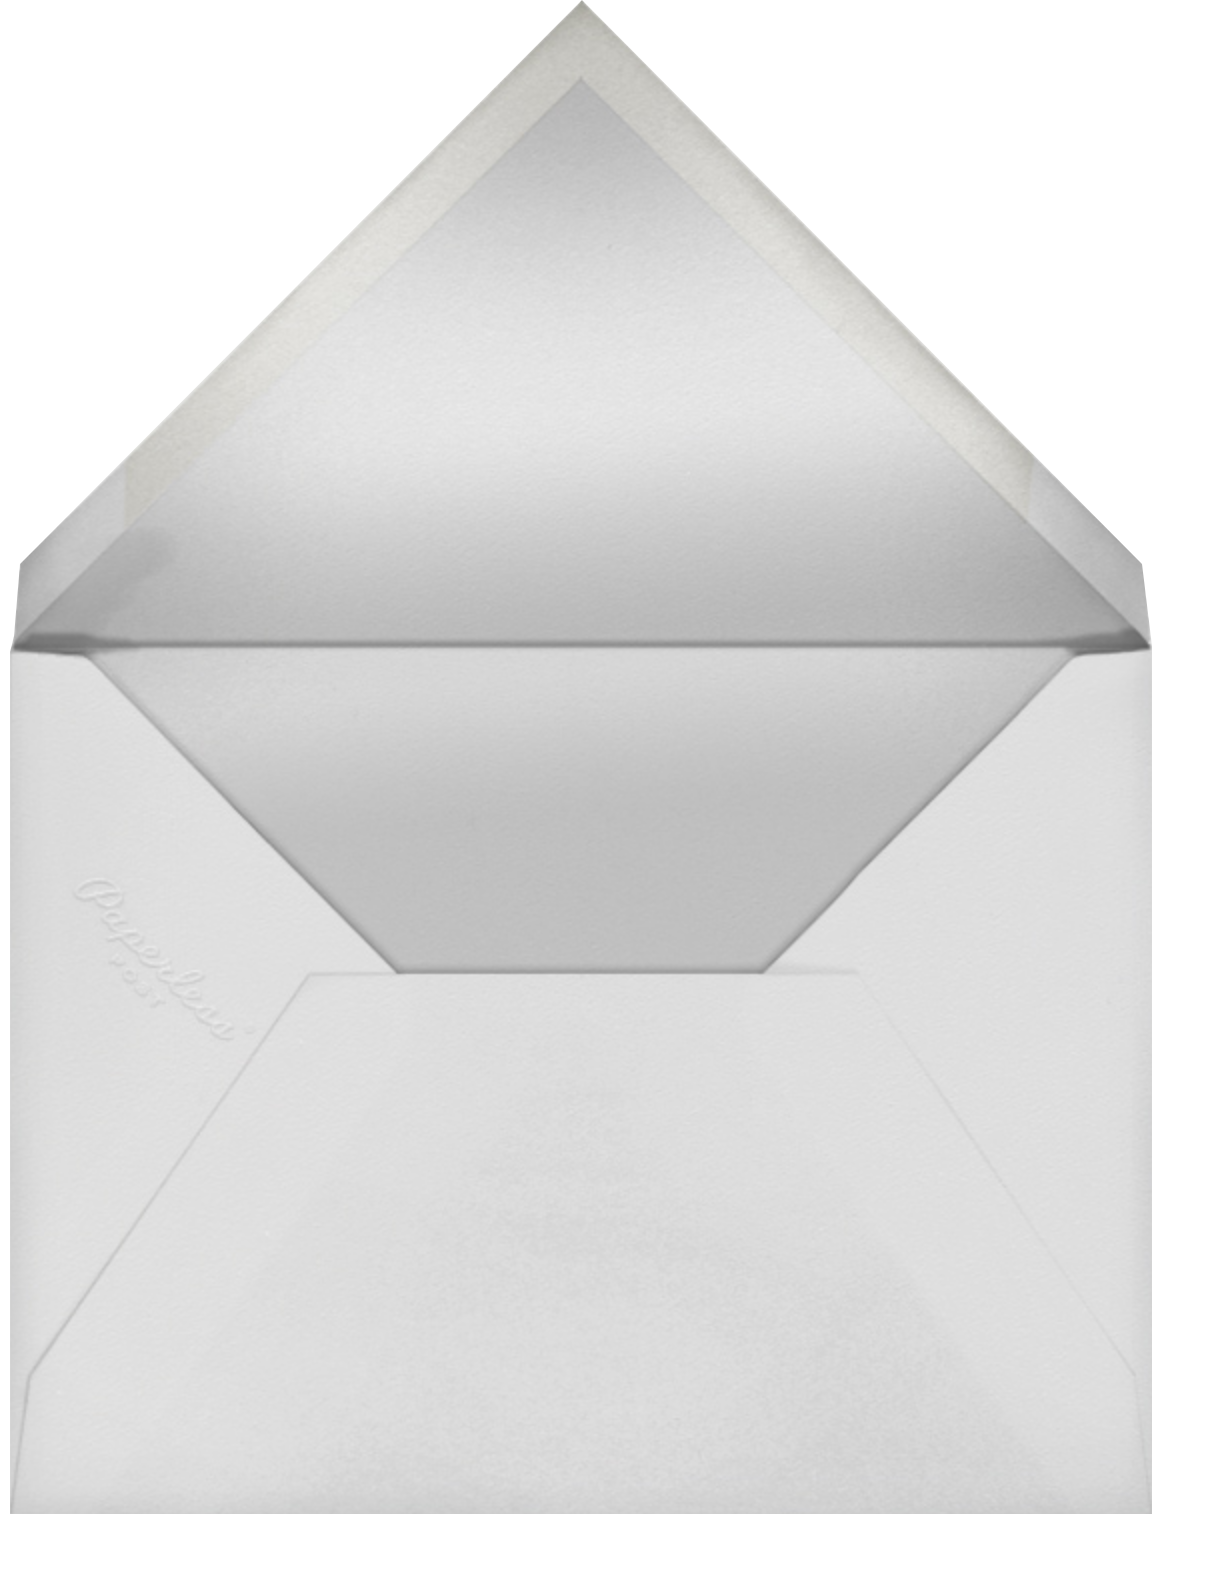 Aubette (Program) - Gold - Paperless Post - Menus and programs - envelope back